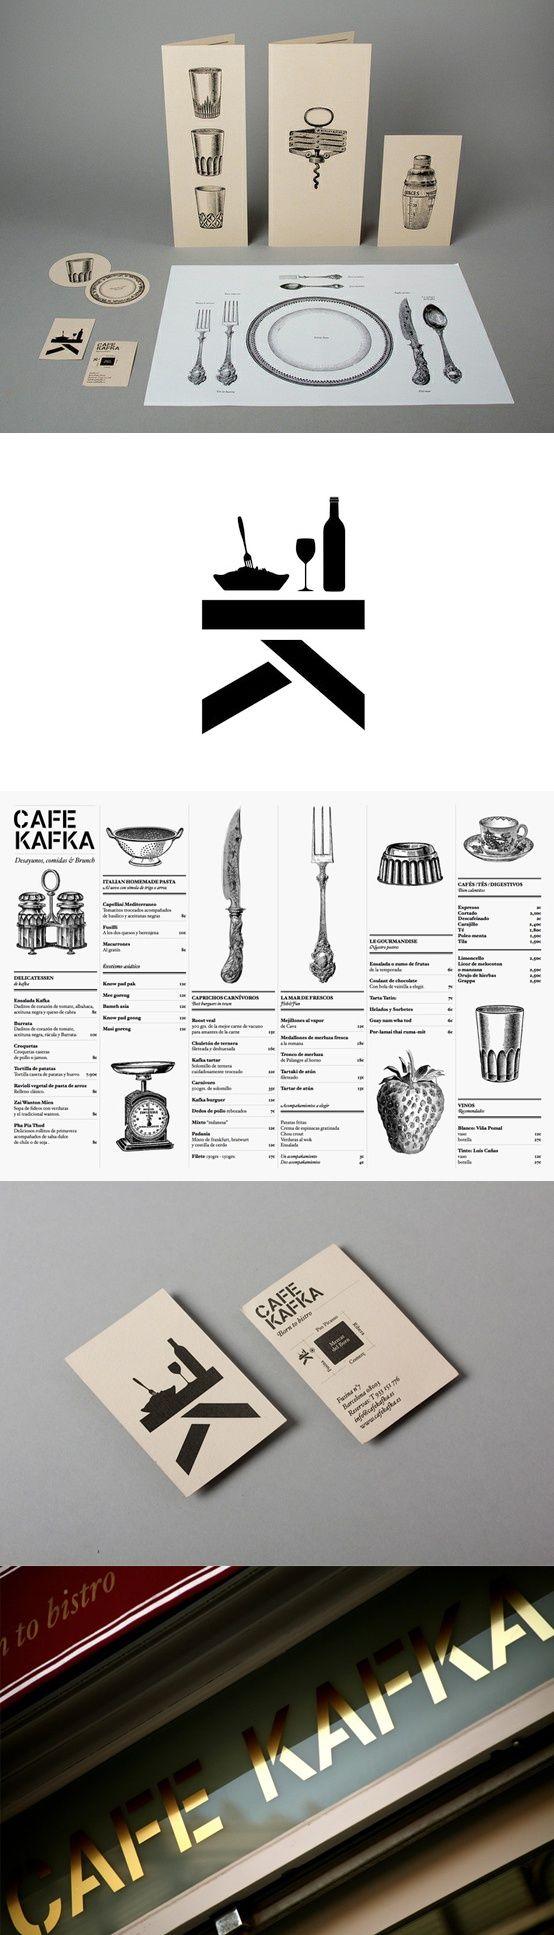 Restaurant designs restaurant logo creator restaurant logo maker - Find This Pin And More On Restaurants By Amritpaldesign